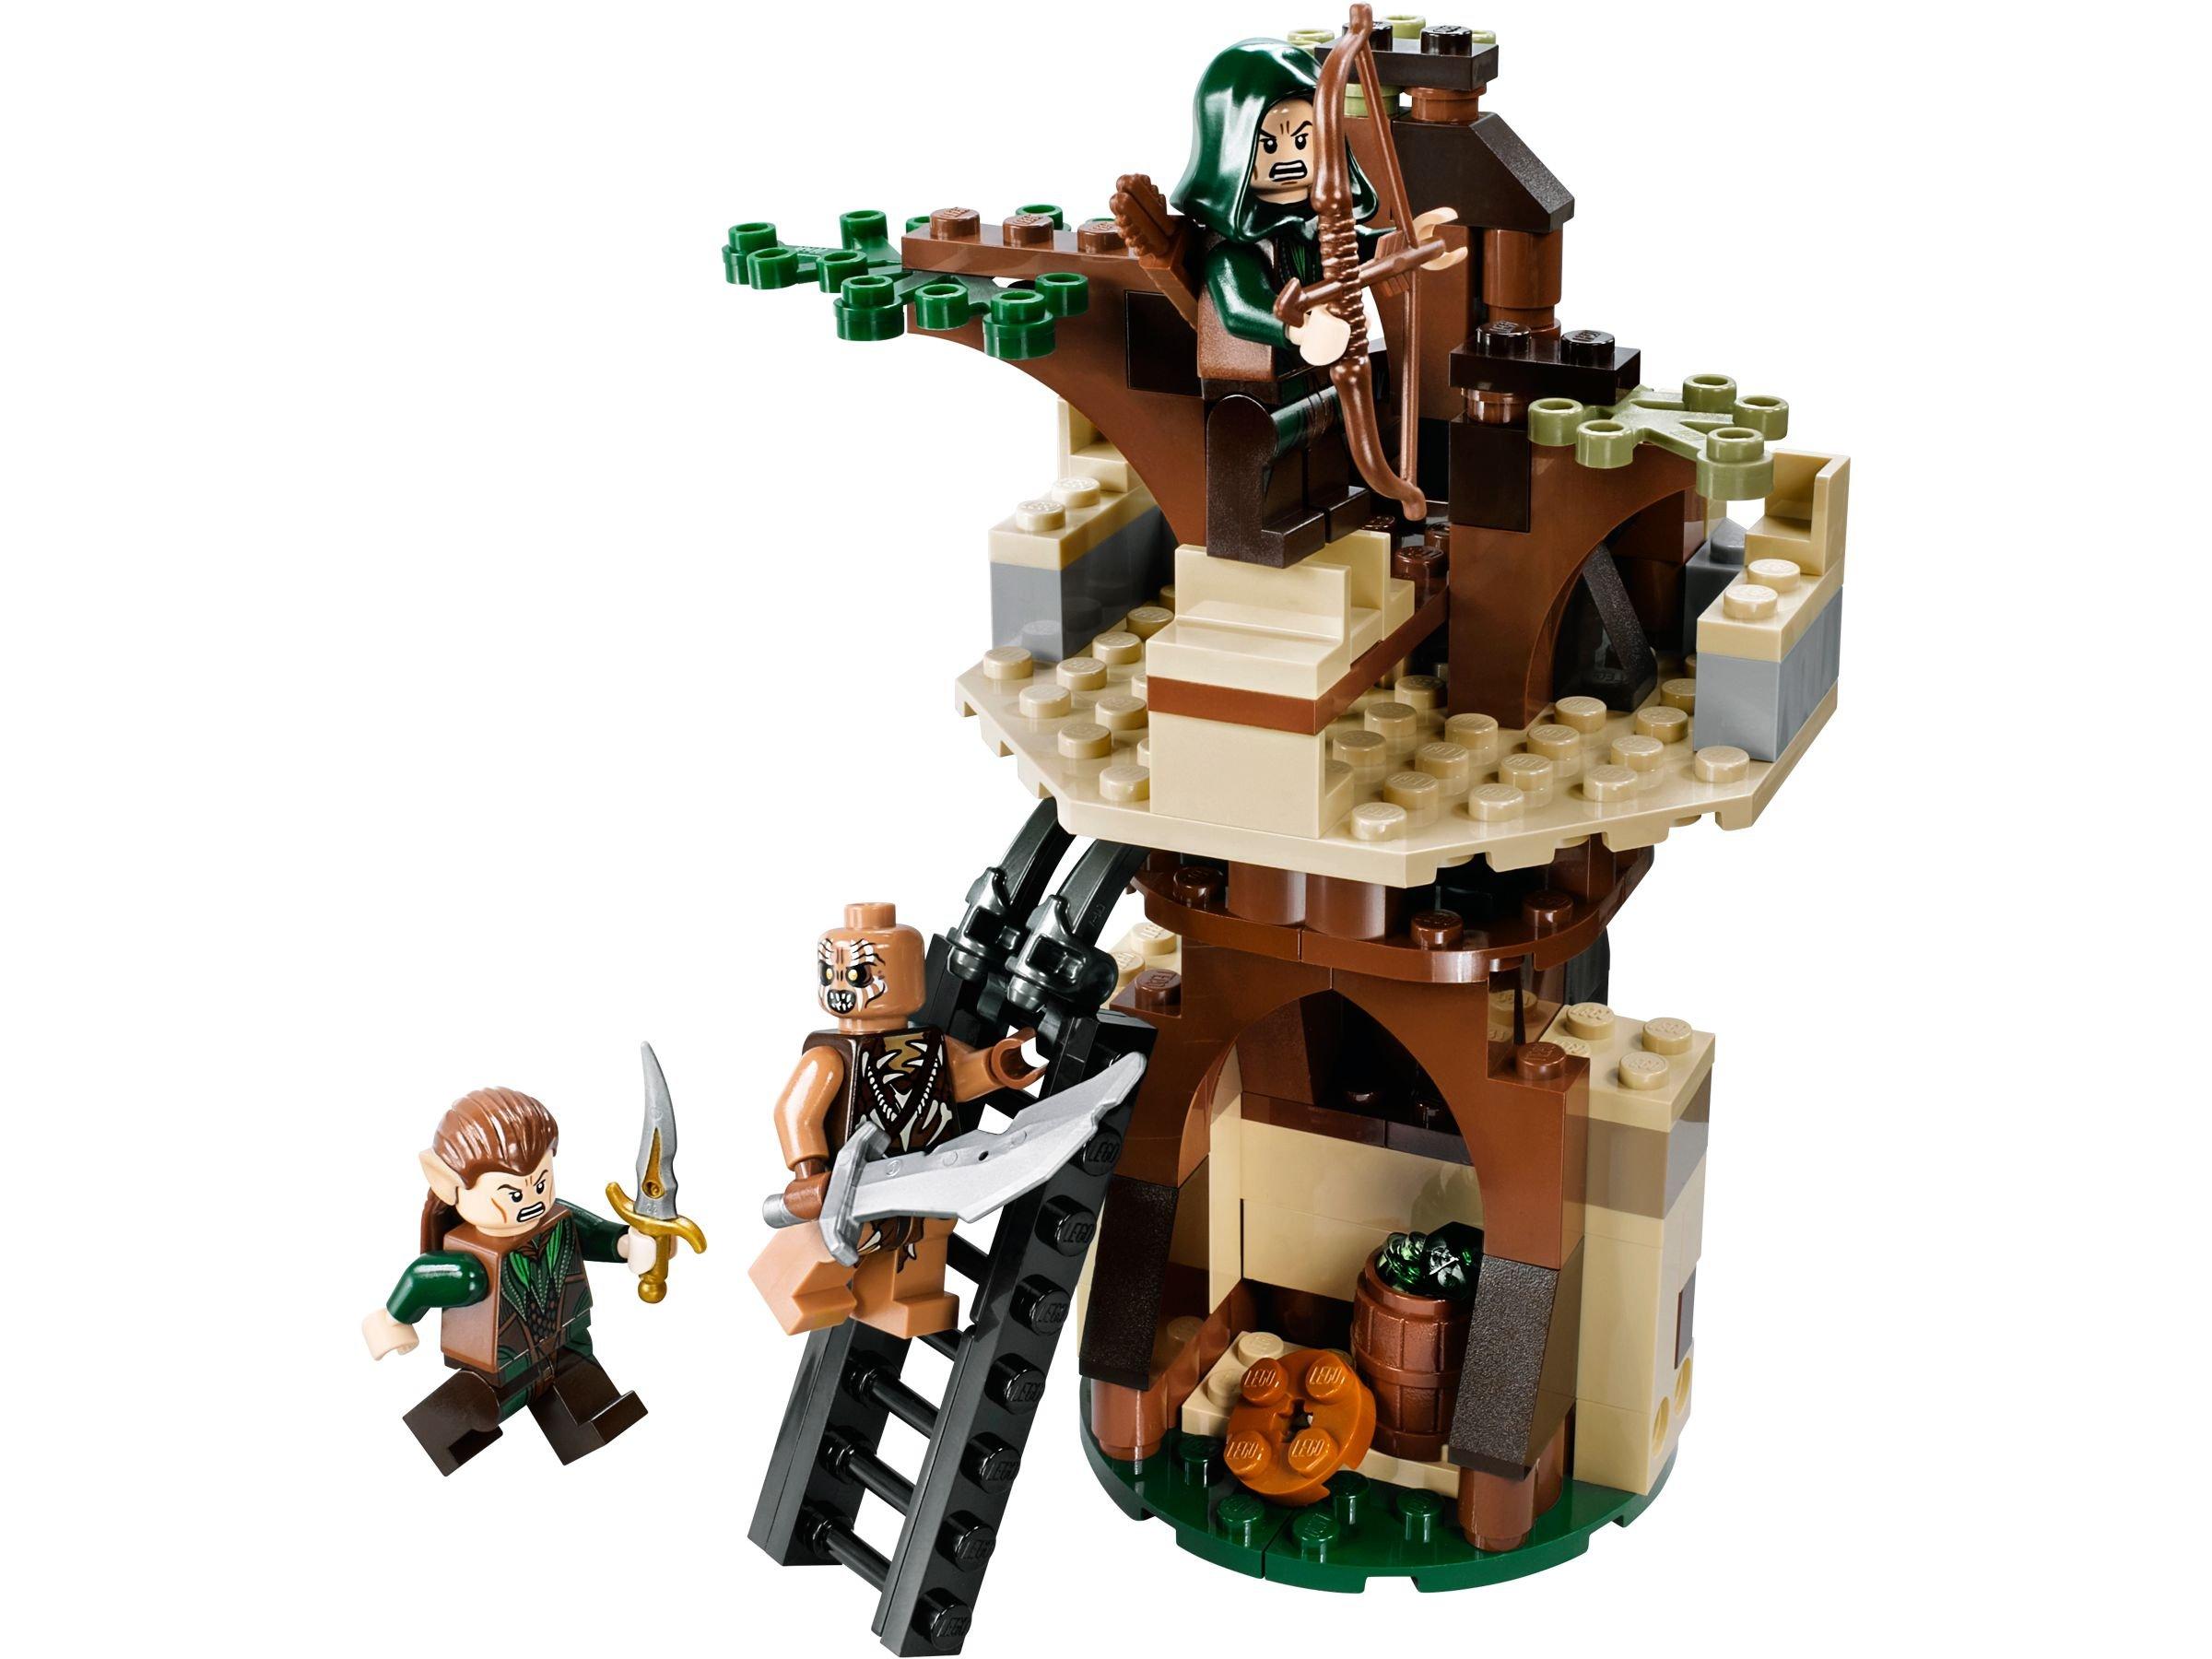 mirkwood elbenarmee 79012 lego the hobbit 2013 im preisvergleich mirkwood elf army. Black Bedroom Furniture Sets. Home Design Ideas